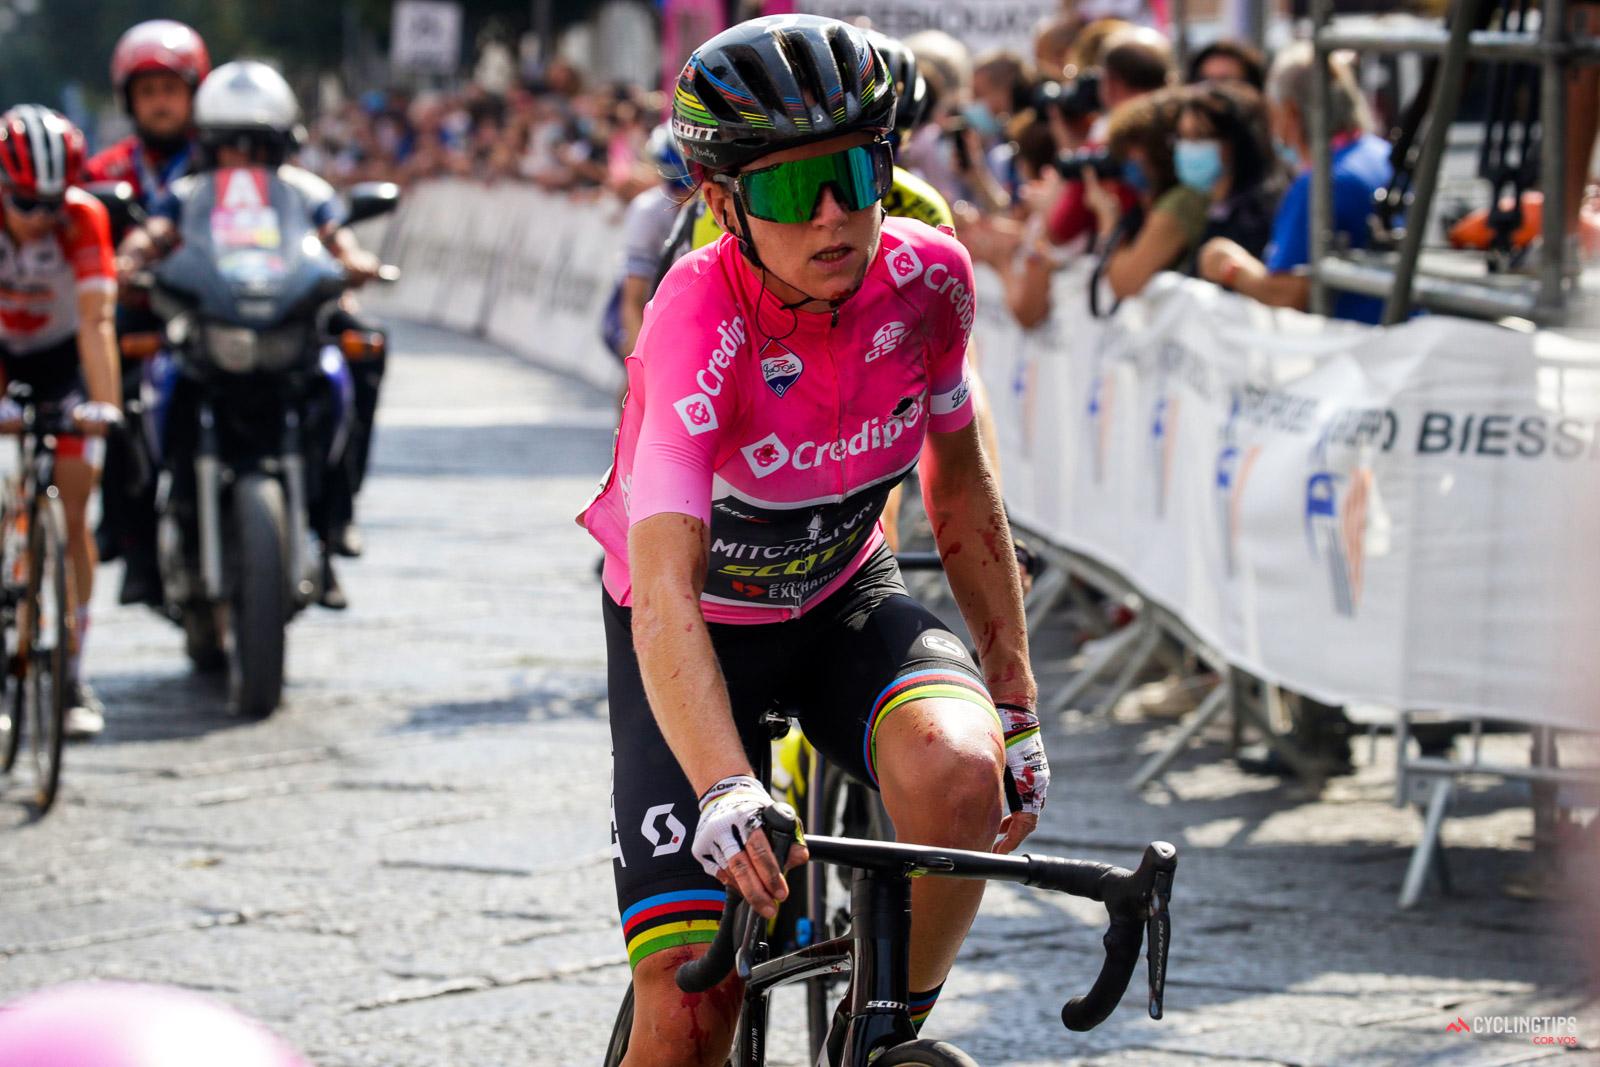 Van Vleuten out of Giro Rosa, will miss Worlds with broken wrist